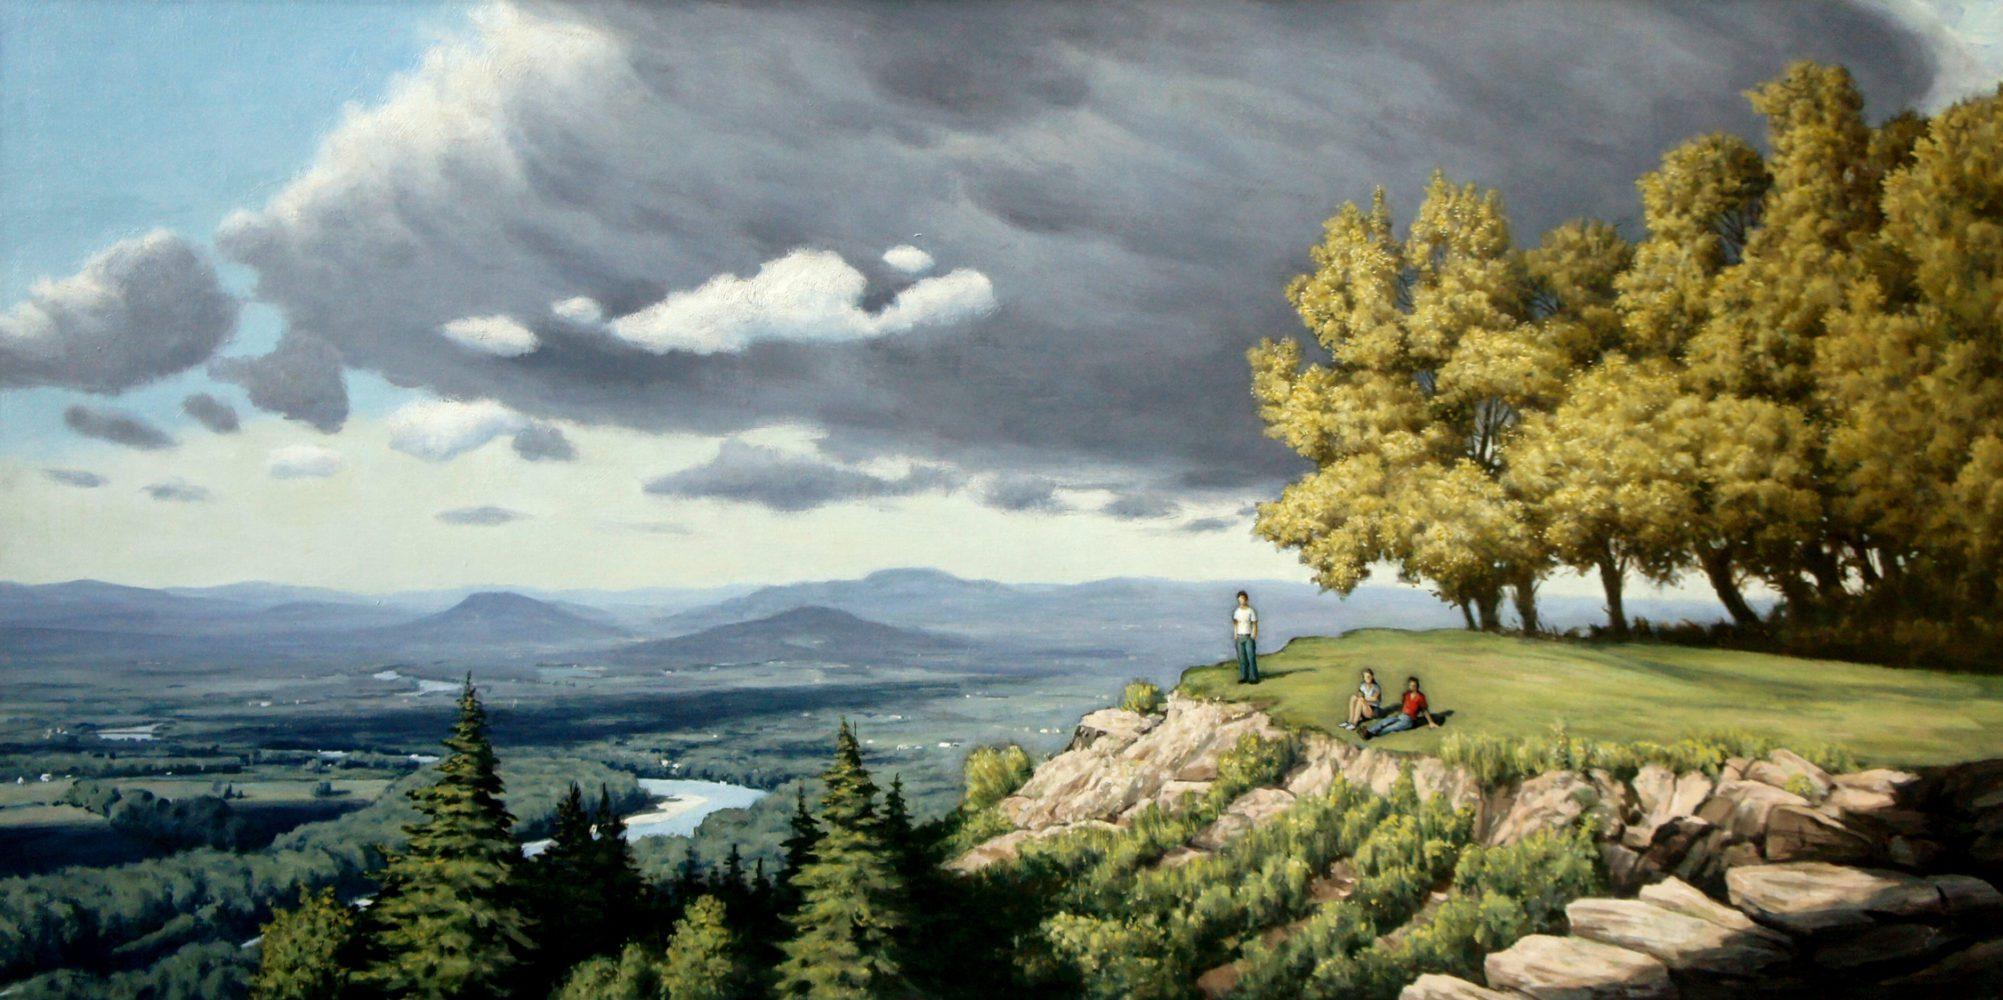 """Views Of The Mt. Holyoke Range"" Exhibit Opening Reception"